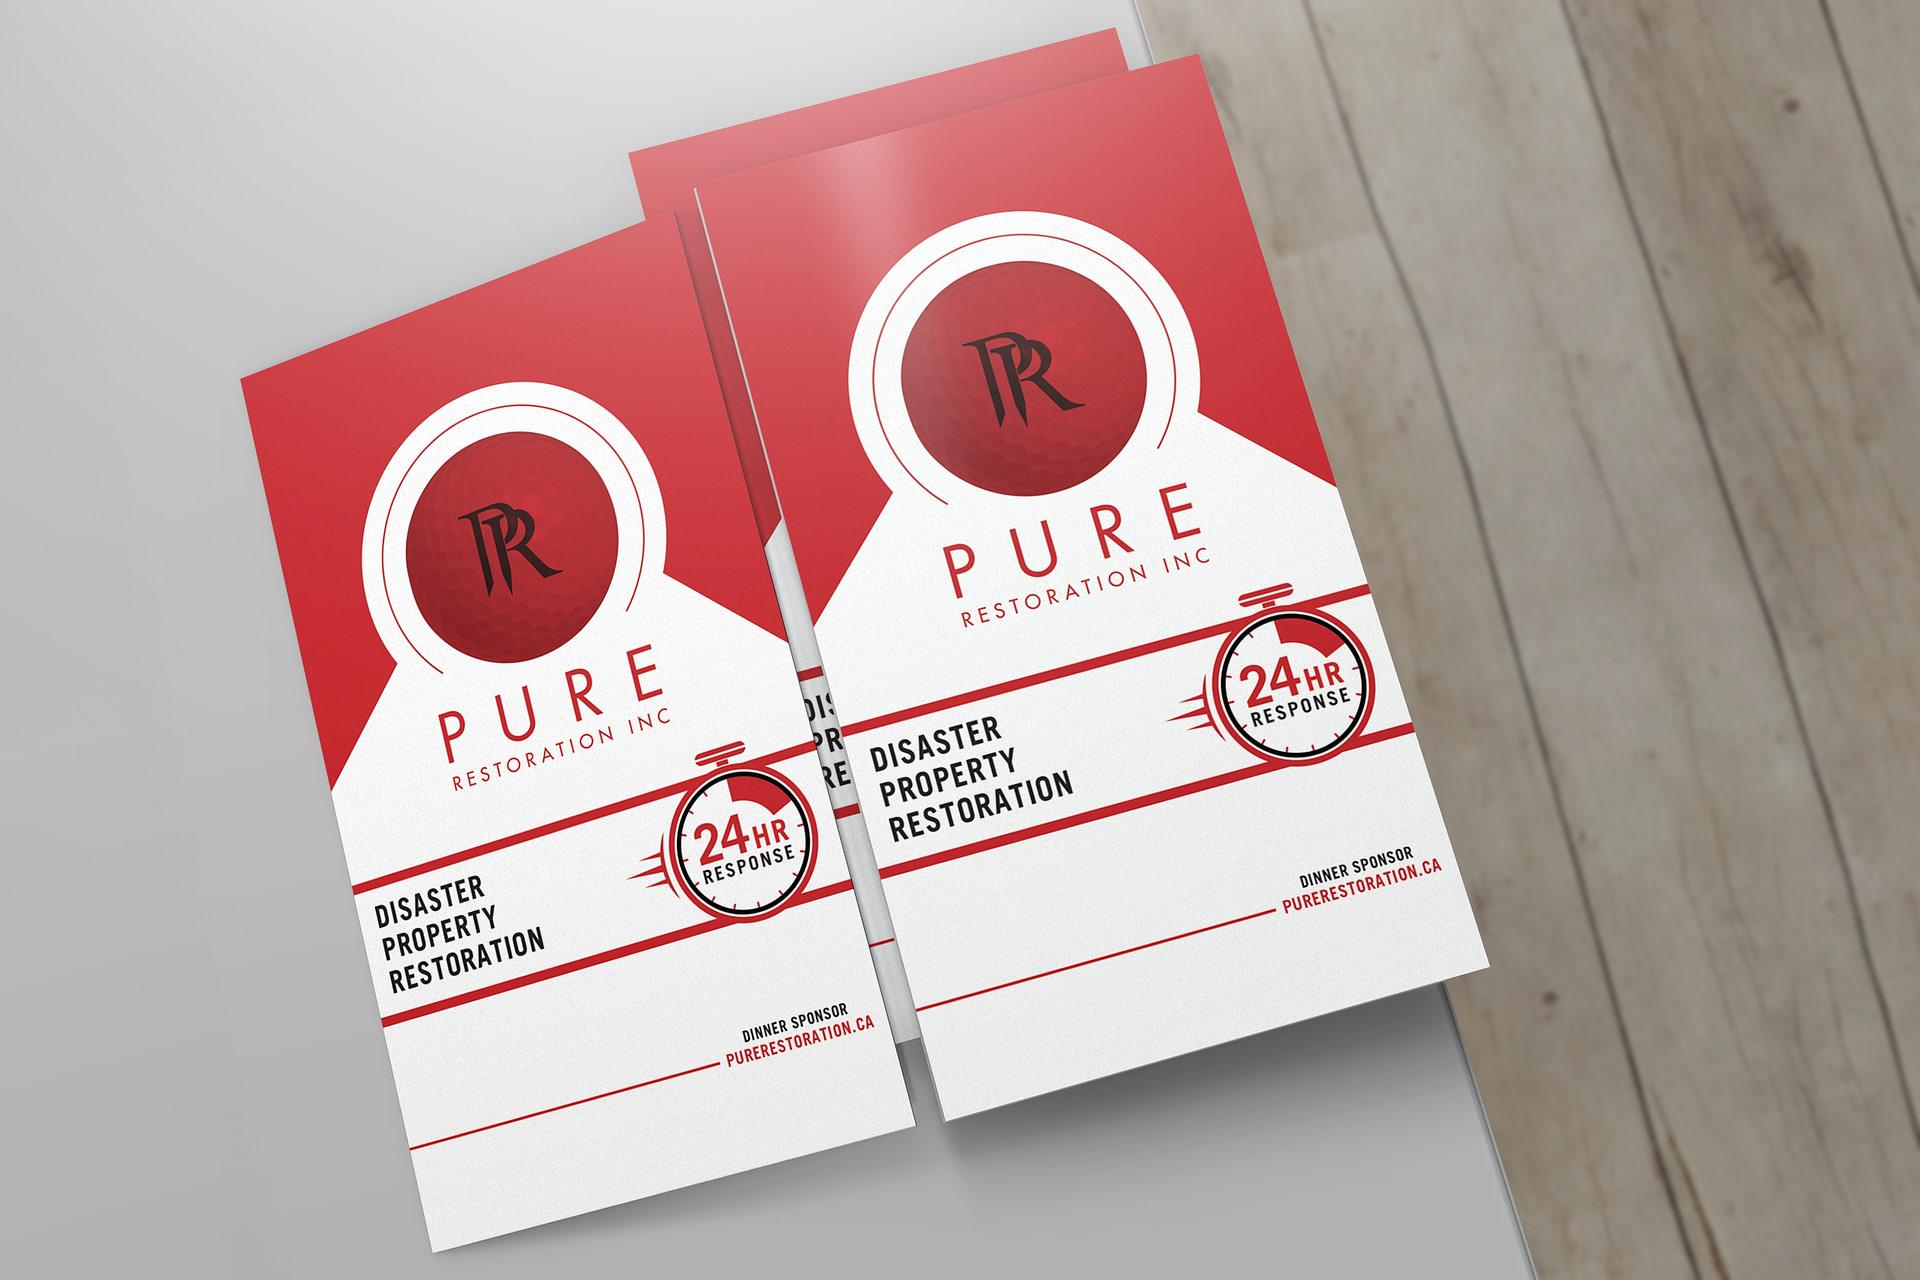 PURE Restoration Brand Asset